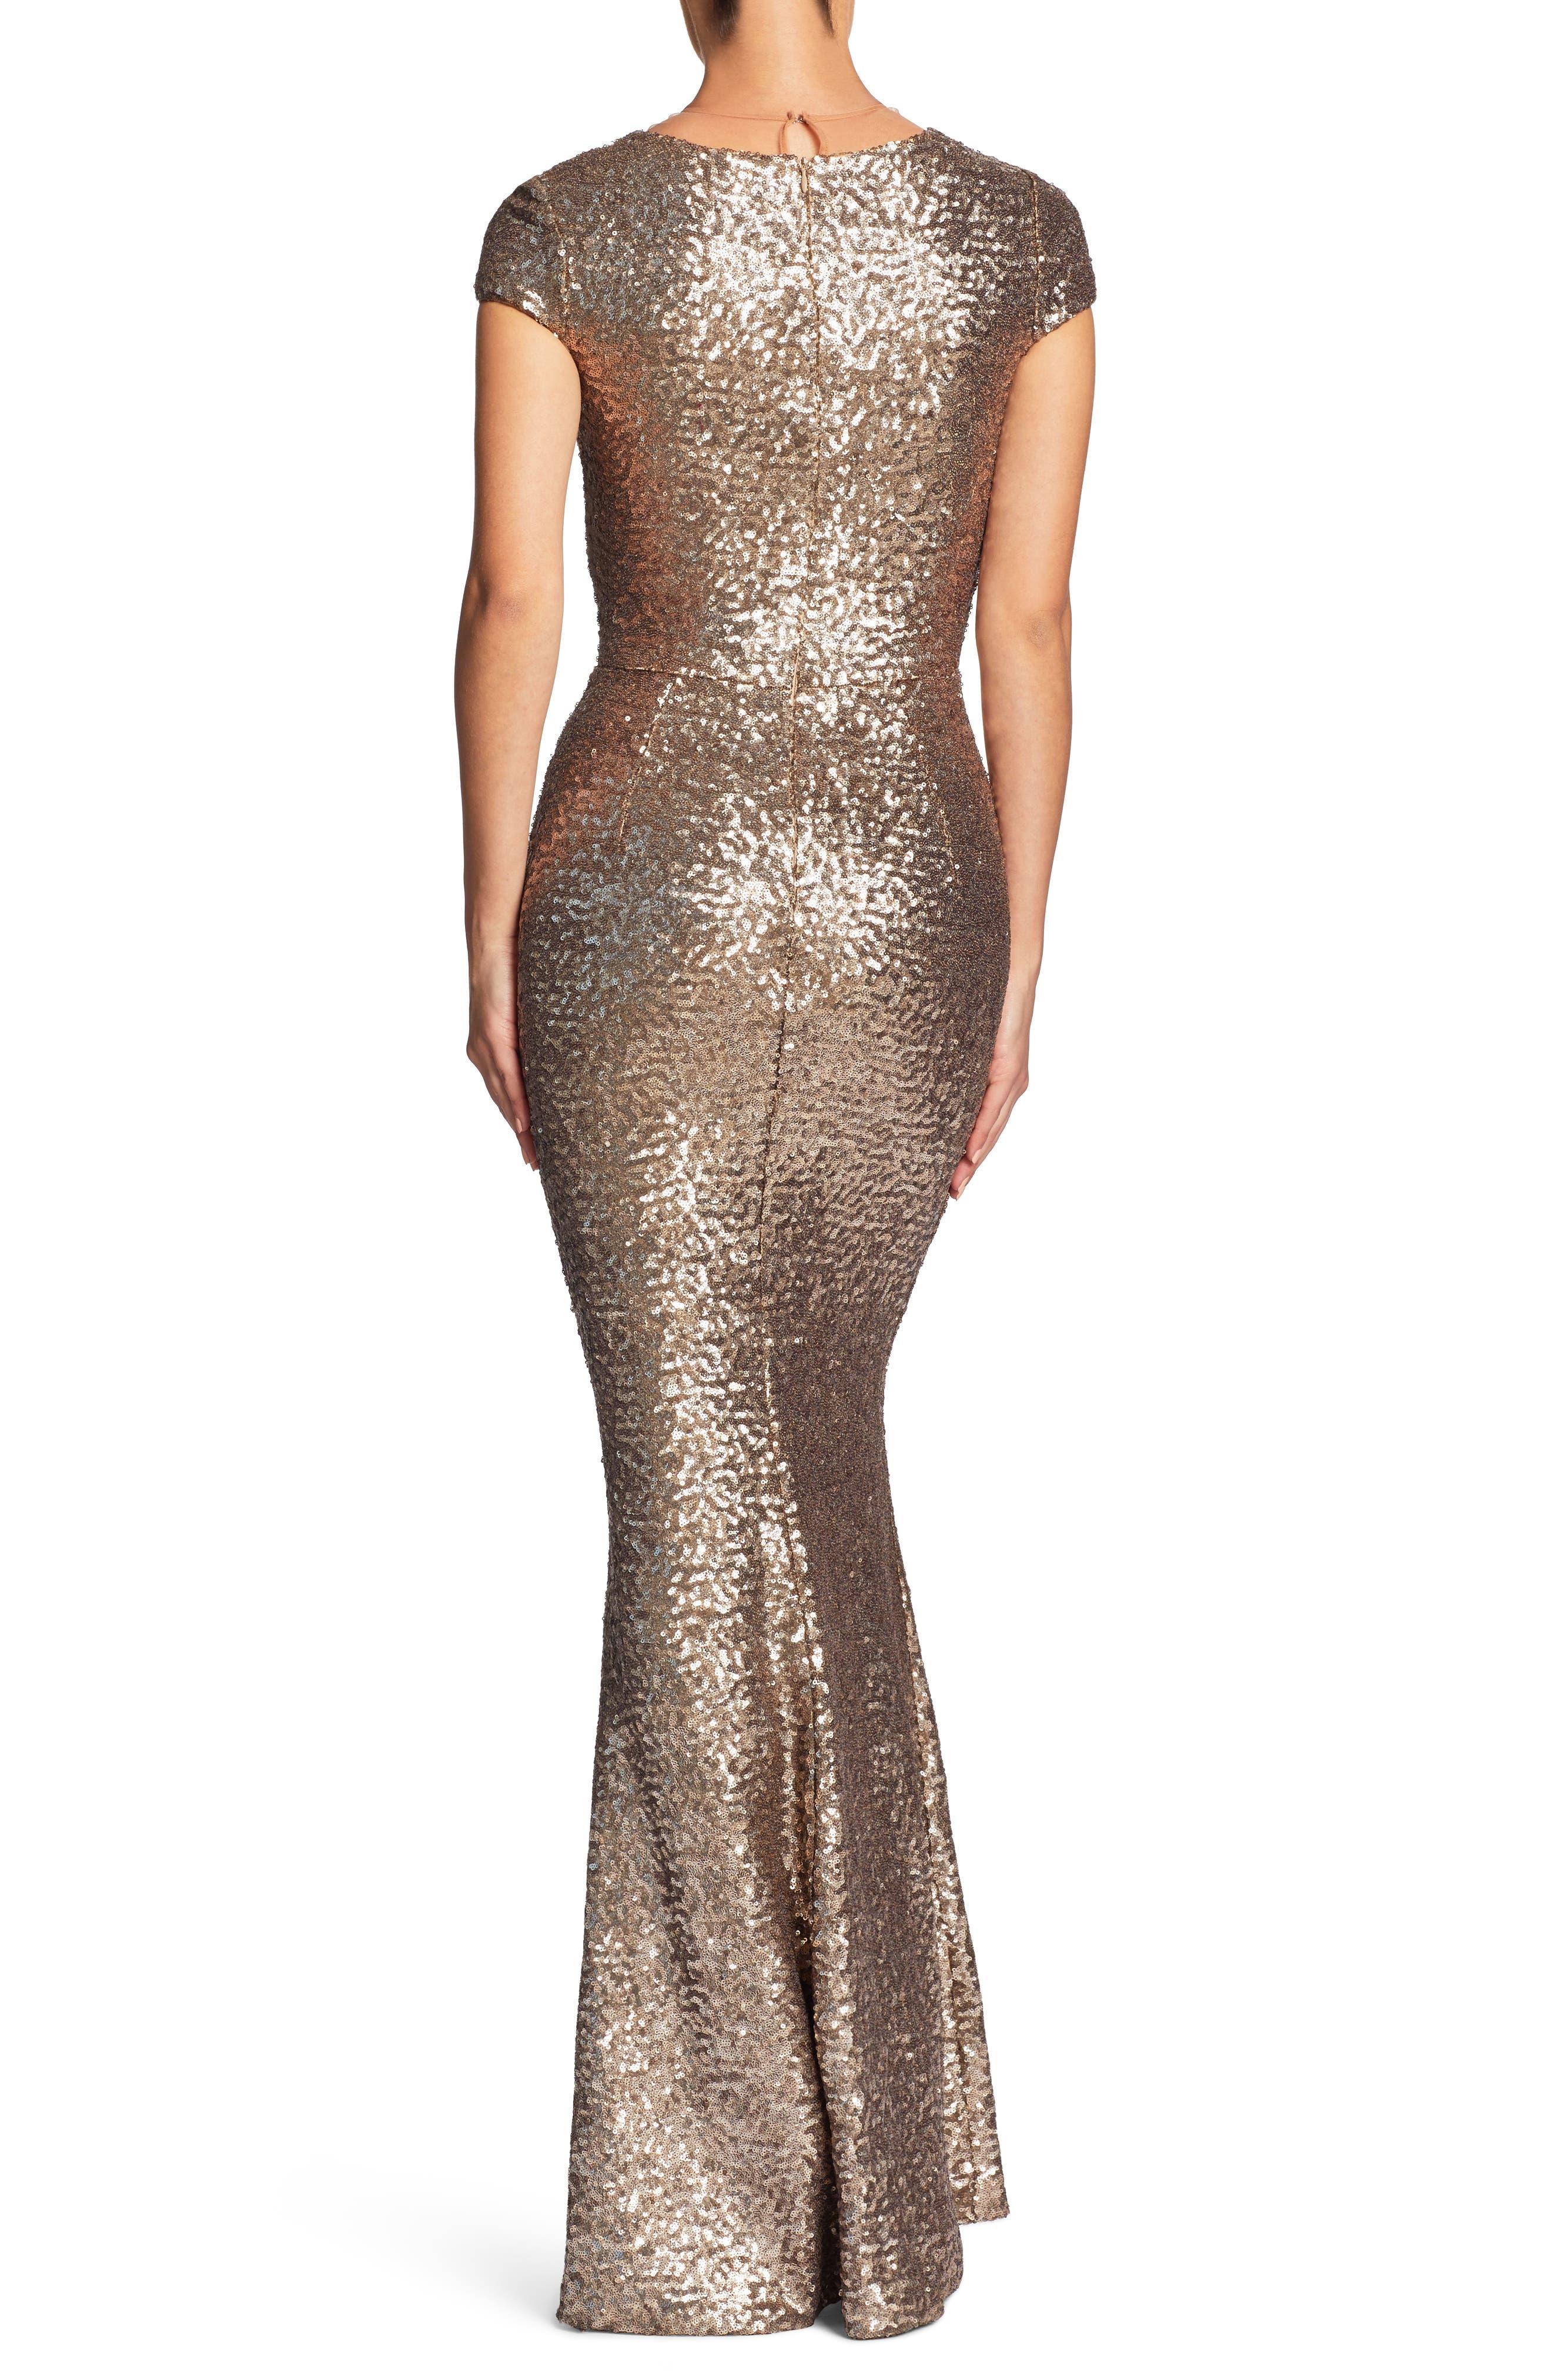 Michelle Sequin Gown,                             Alternate thumbnail 2, color,                             BRASS